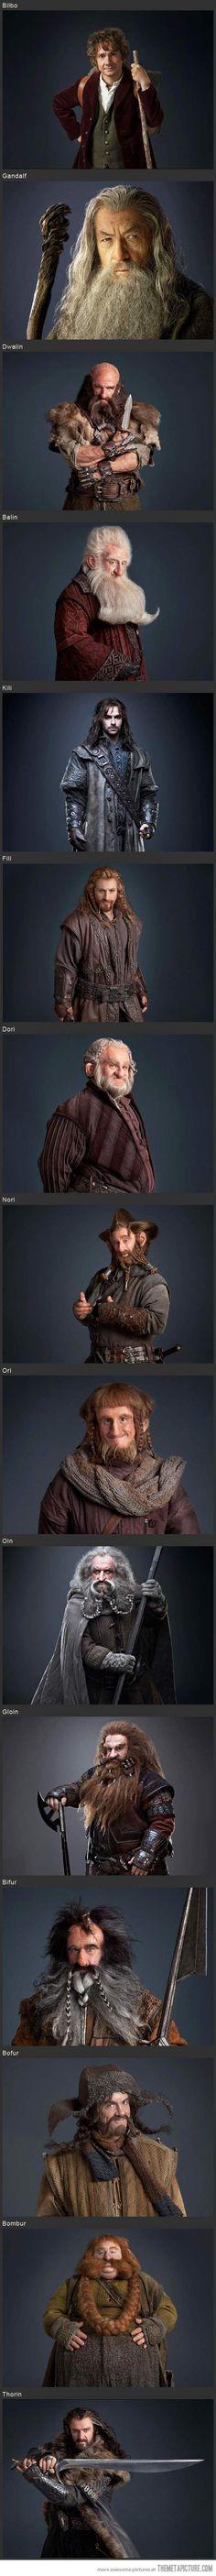 The Hobbit; Bofur has an axe in his forehead.